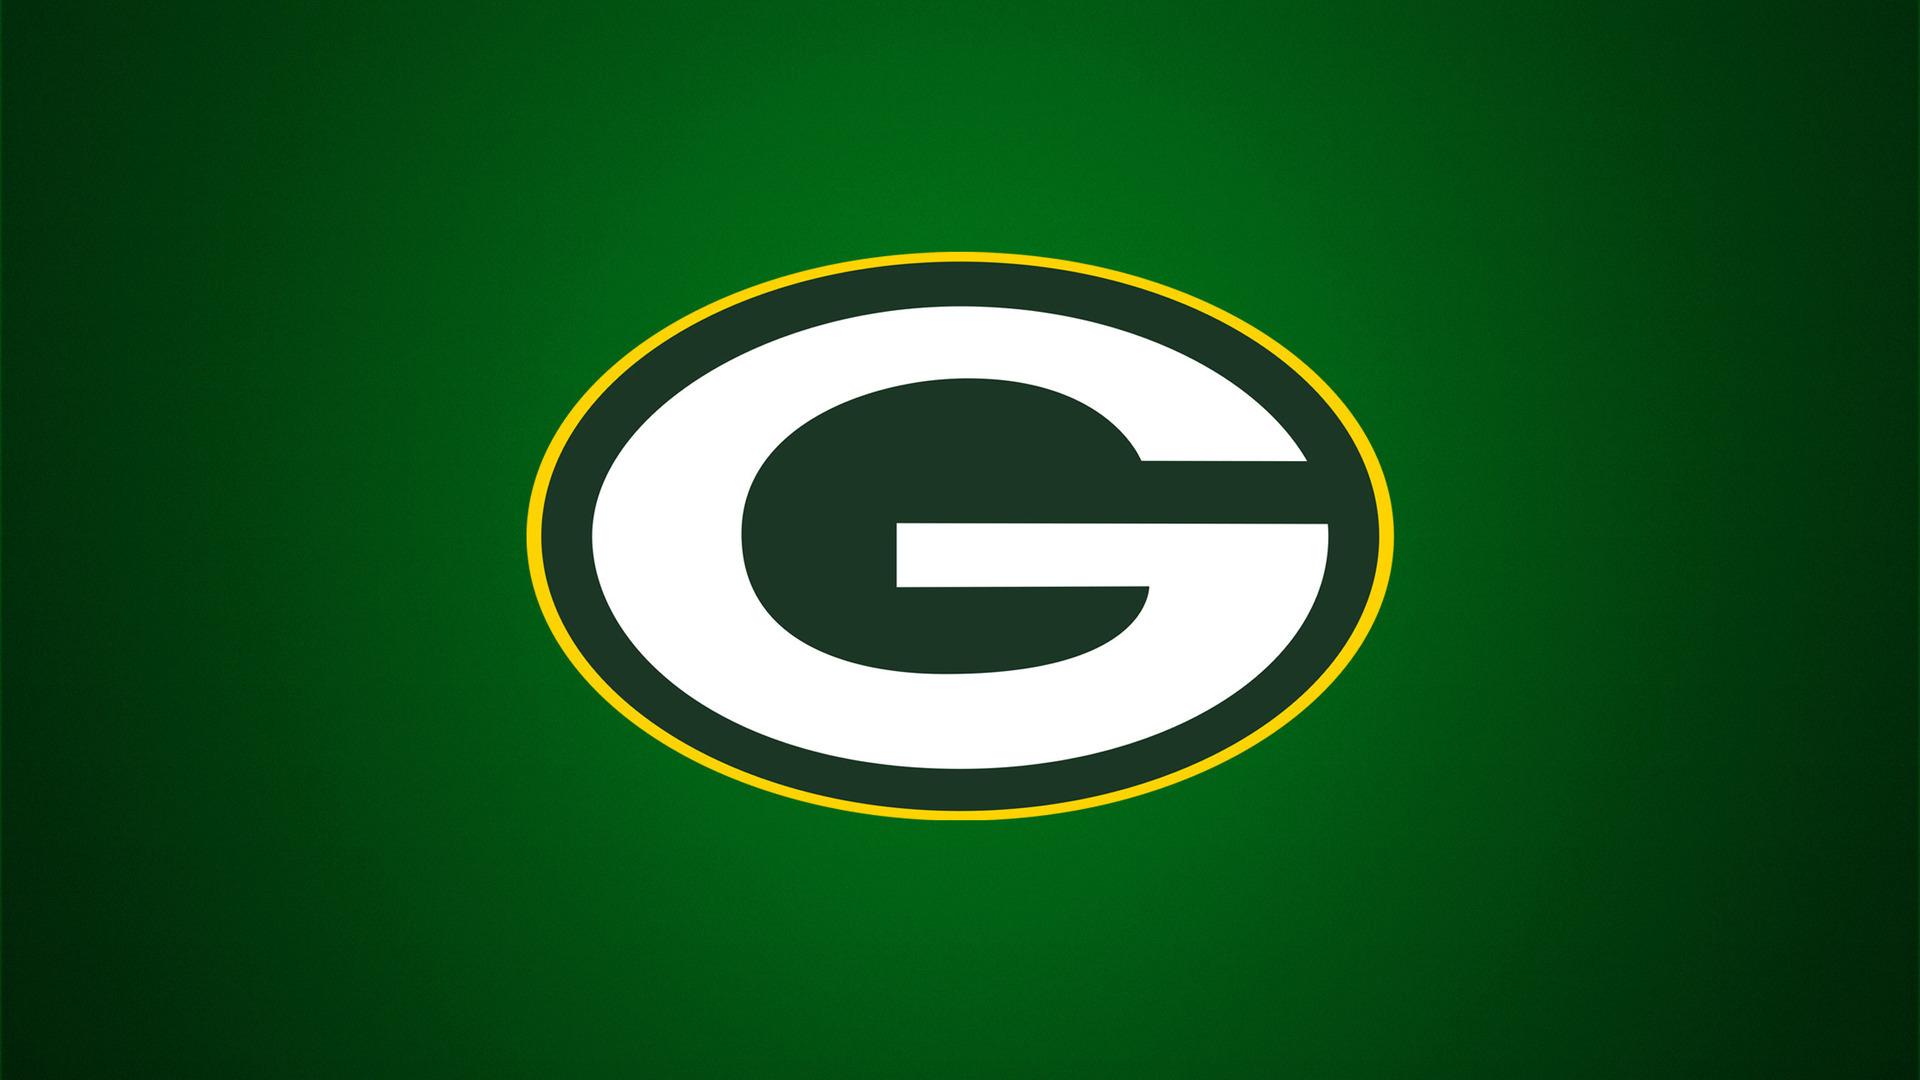 Green Bay Packers 1920x1080 HD Image Sports NFL Football 1920x1080